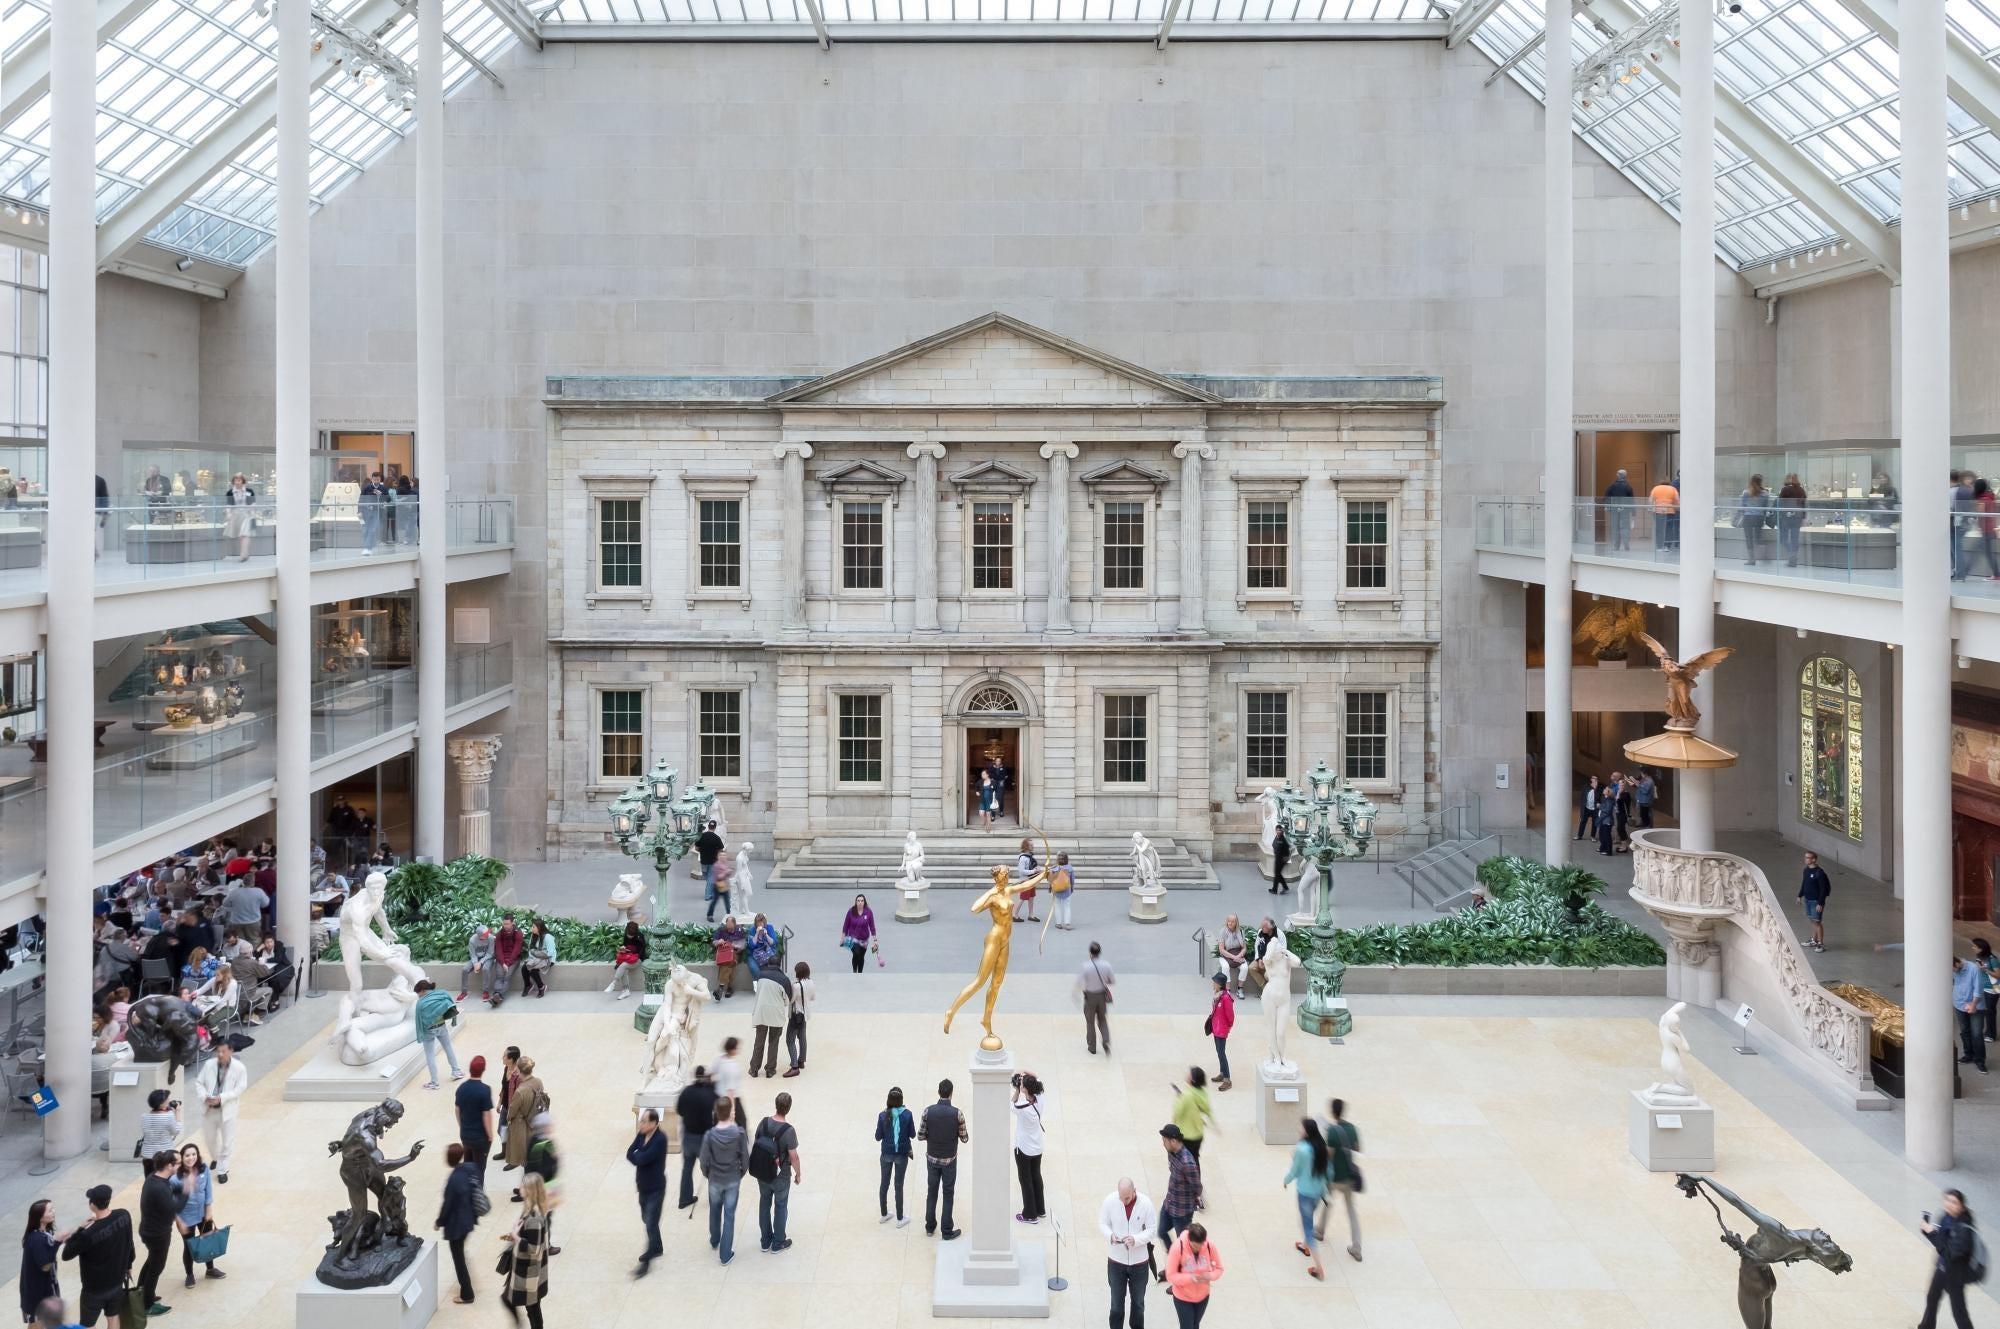 TripAdvisor names the world's top museums